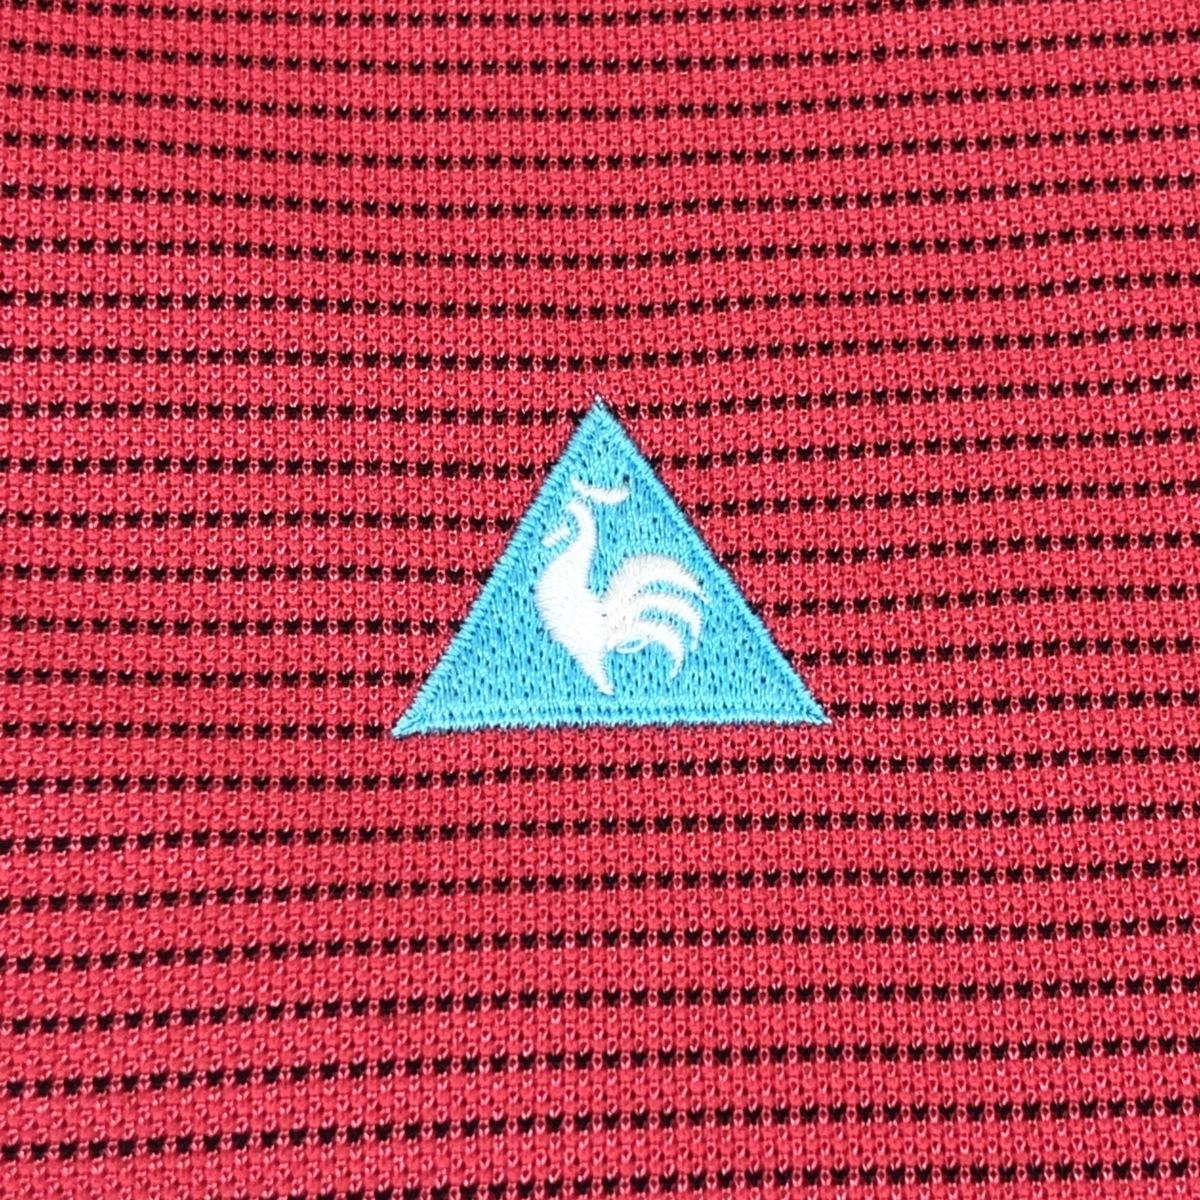 le coq sportif GOLF ルコックゴルフ 吸汗速乾 ロゴ刺繍 ハーフジップ ドライ ゴルフシャツ M ピンク メンズ 半袖 ボーダー 国内正規品_画像5